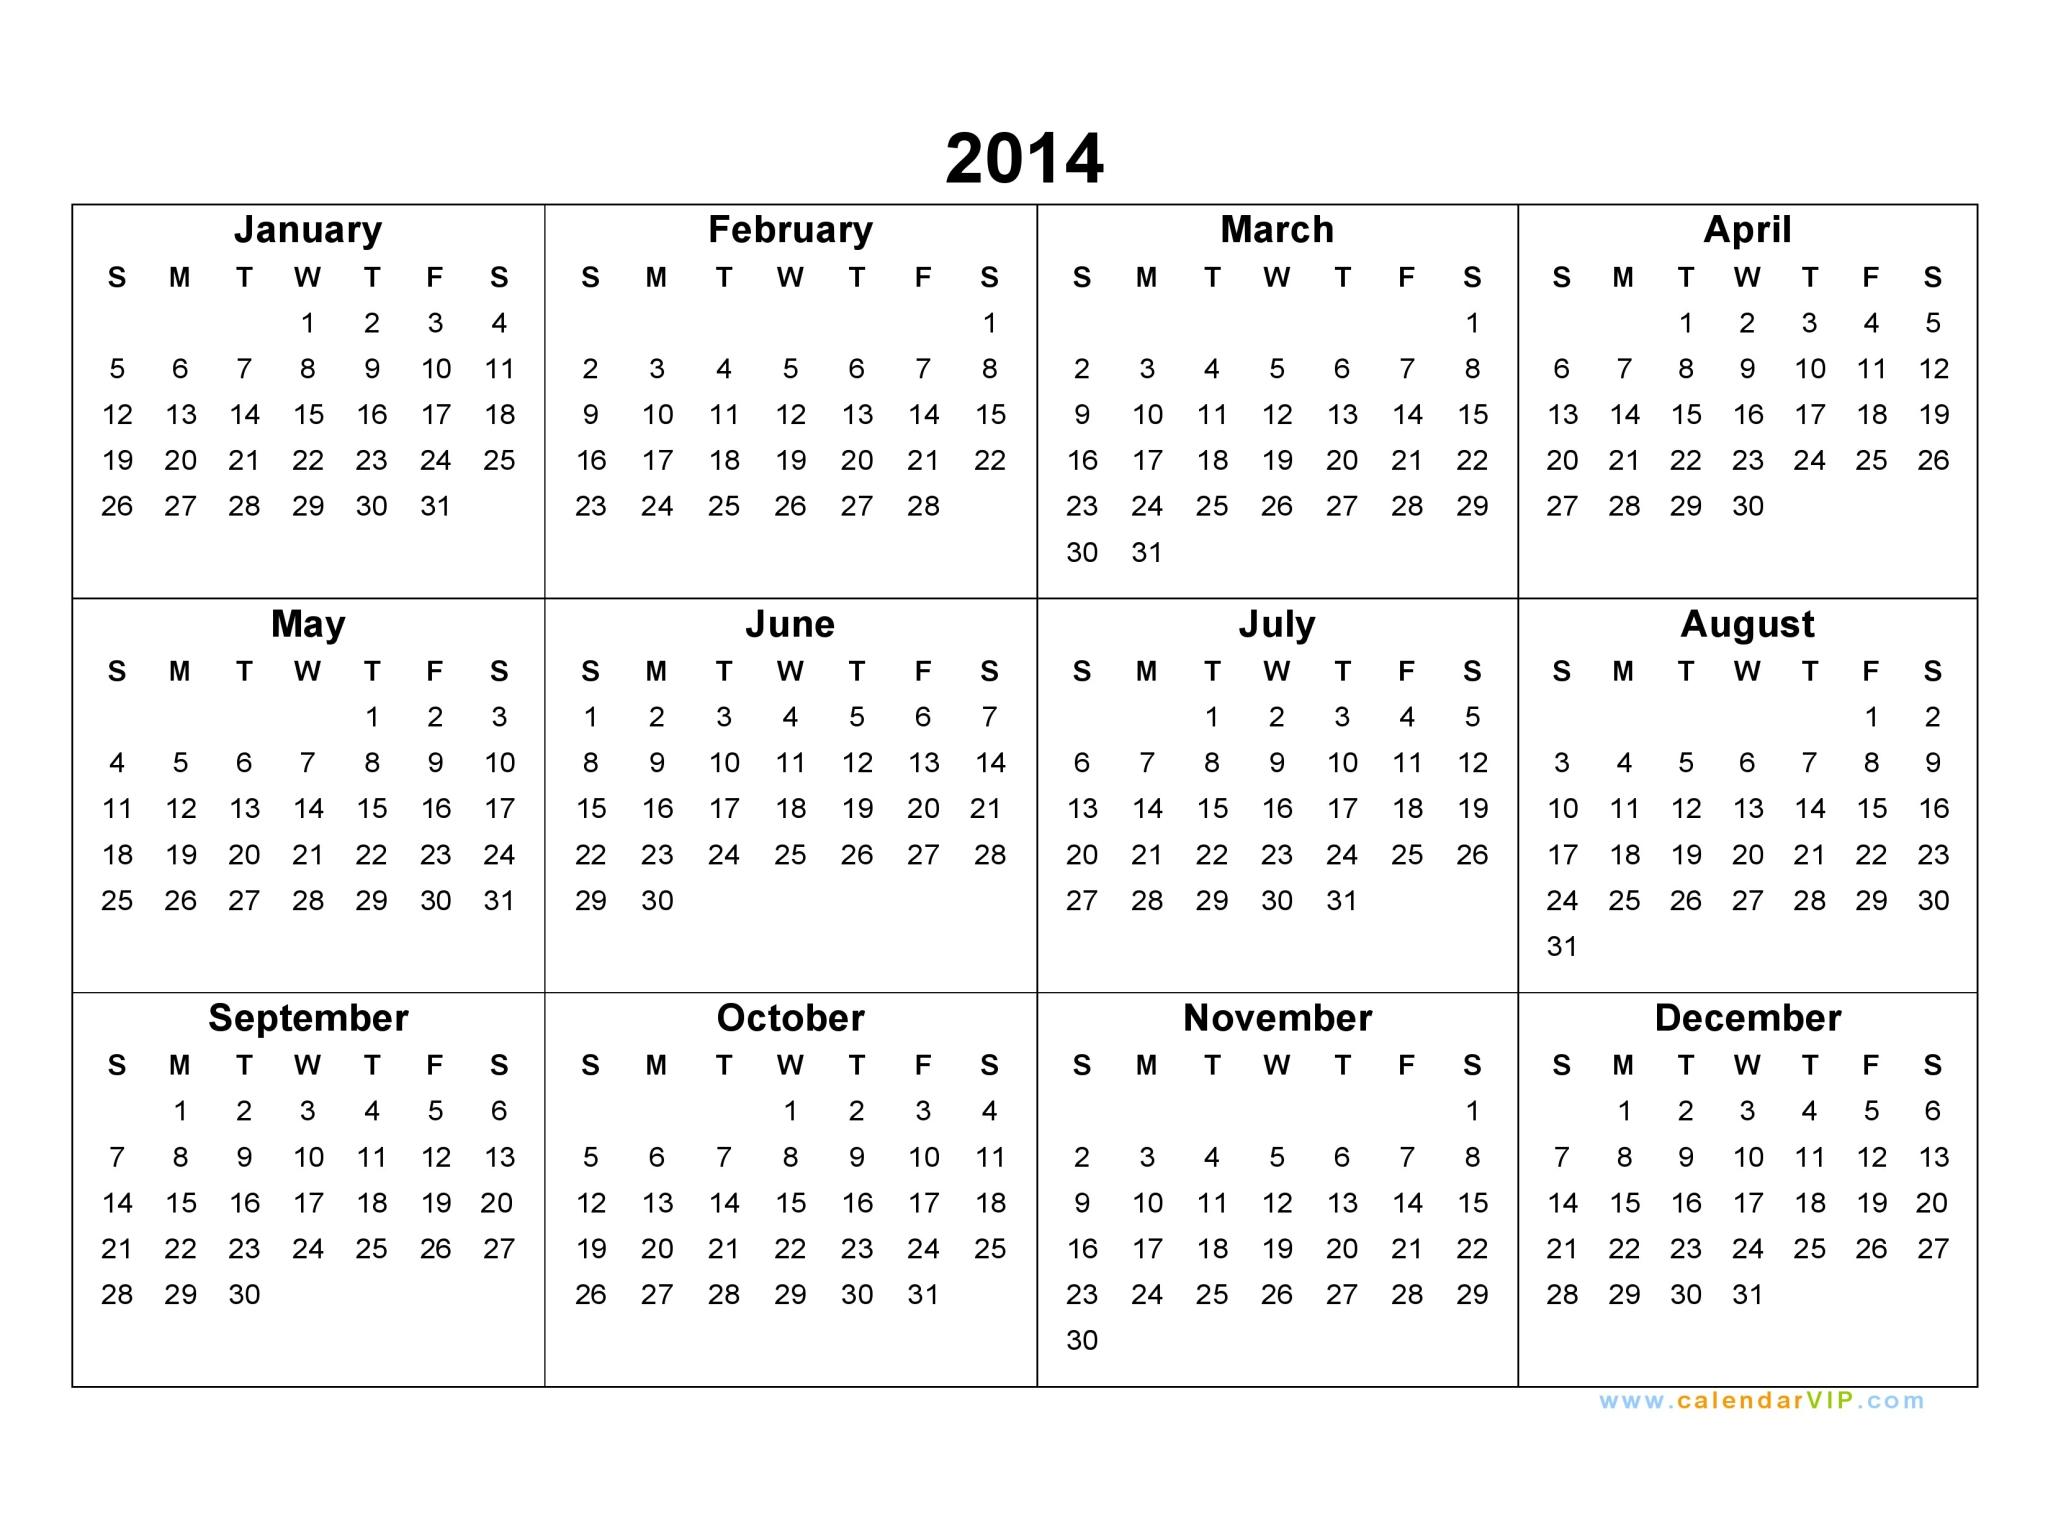 2014 Calendar - Blank Printable Calendar Template In Pdf Word Excel with 2014 12 Month Blank Calendar